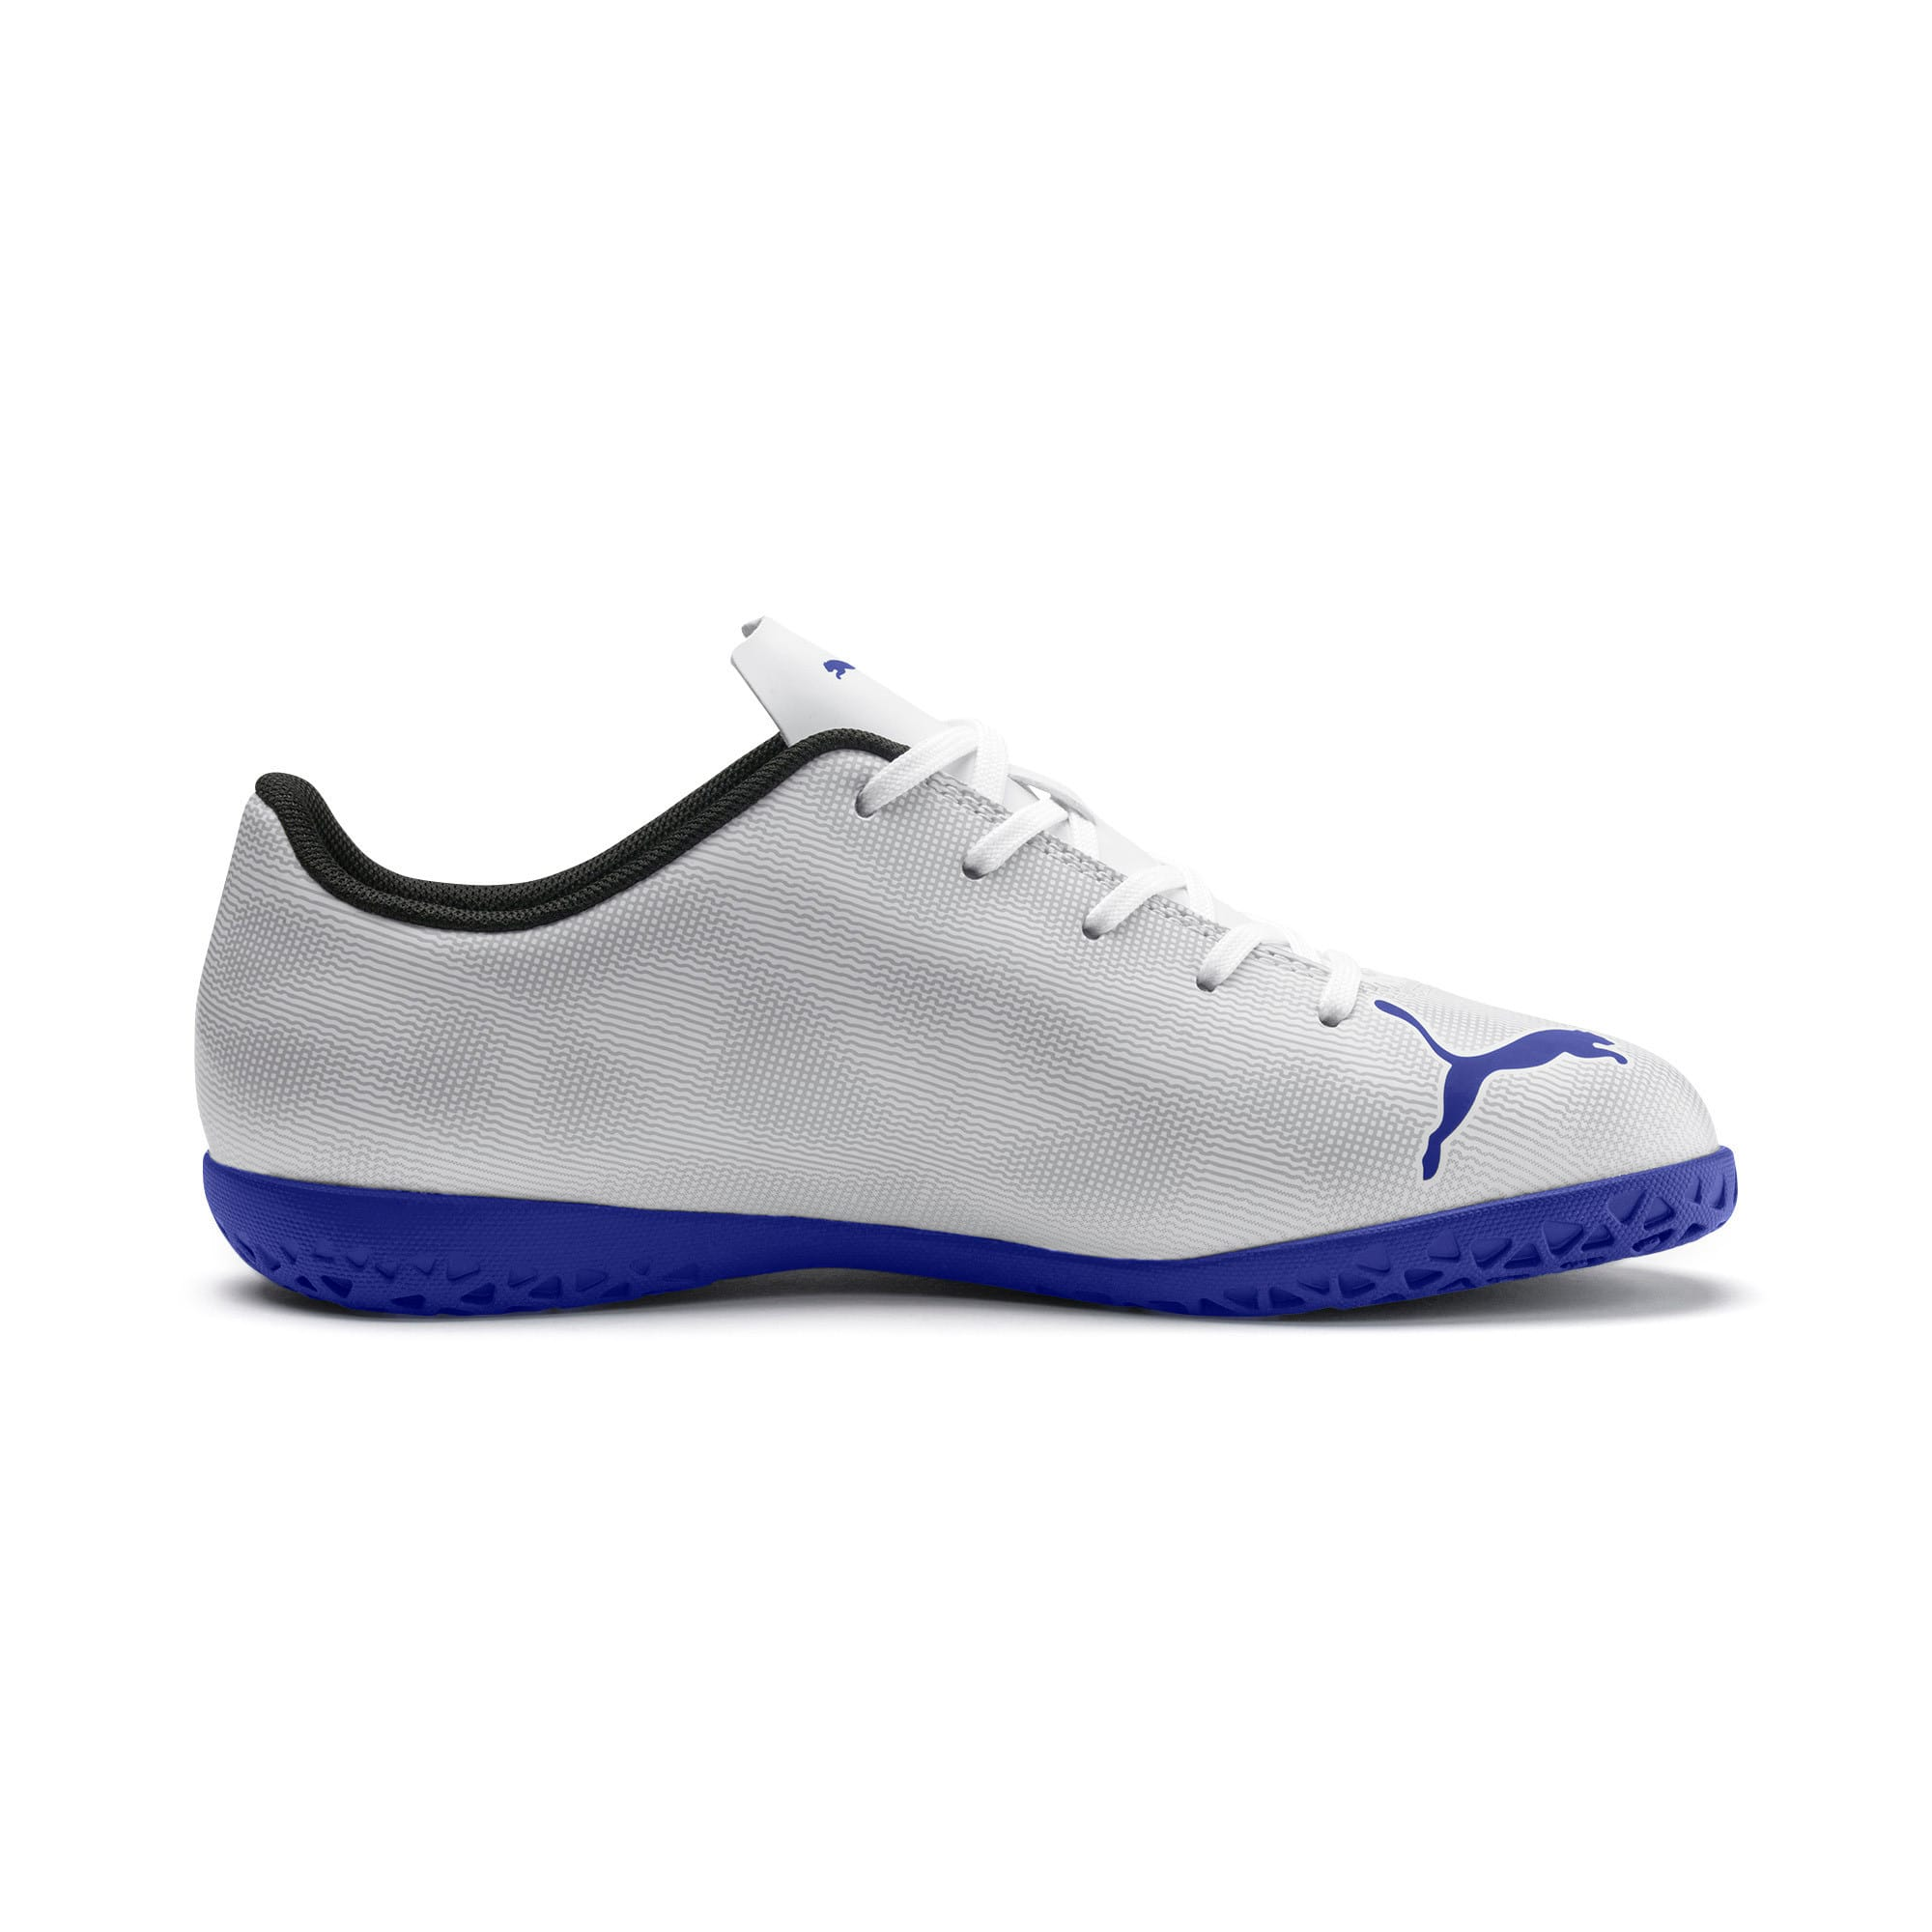 Thumbnail 5 of Rapido IT Boy's Soccer Shoes JR, White-Royal Blue-Light Gray, medium